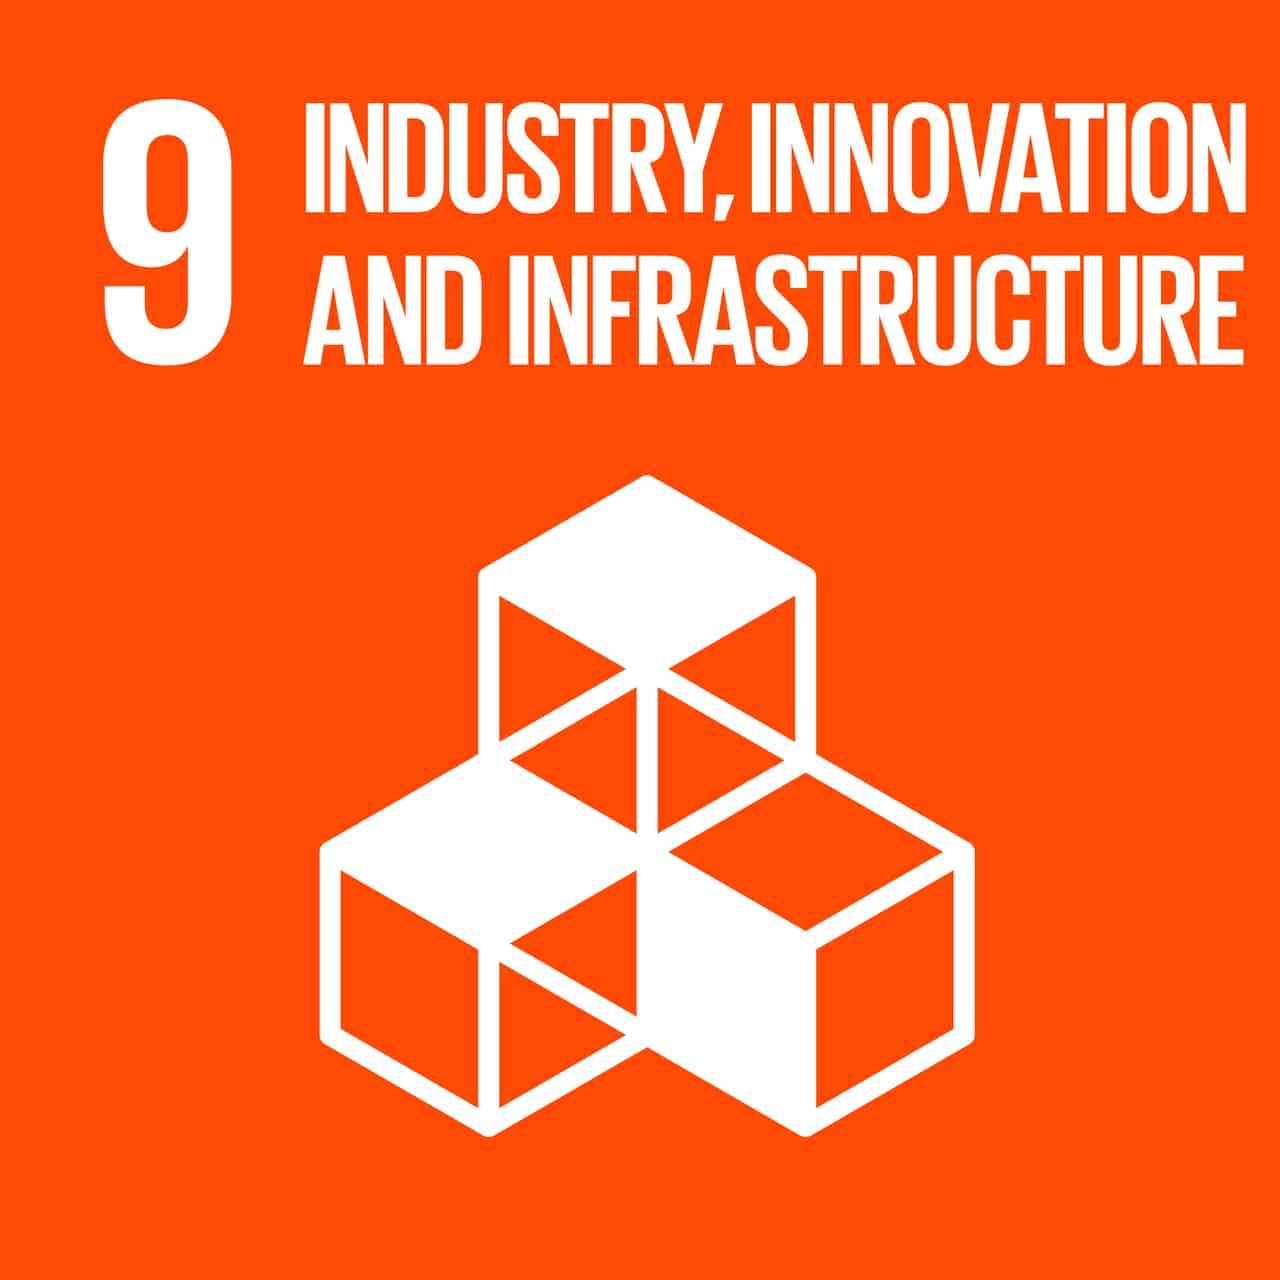 E_SDG goals_icons-individual-cmyk-09